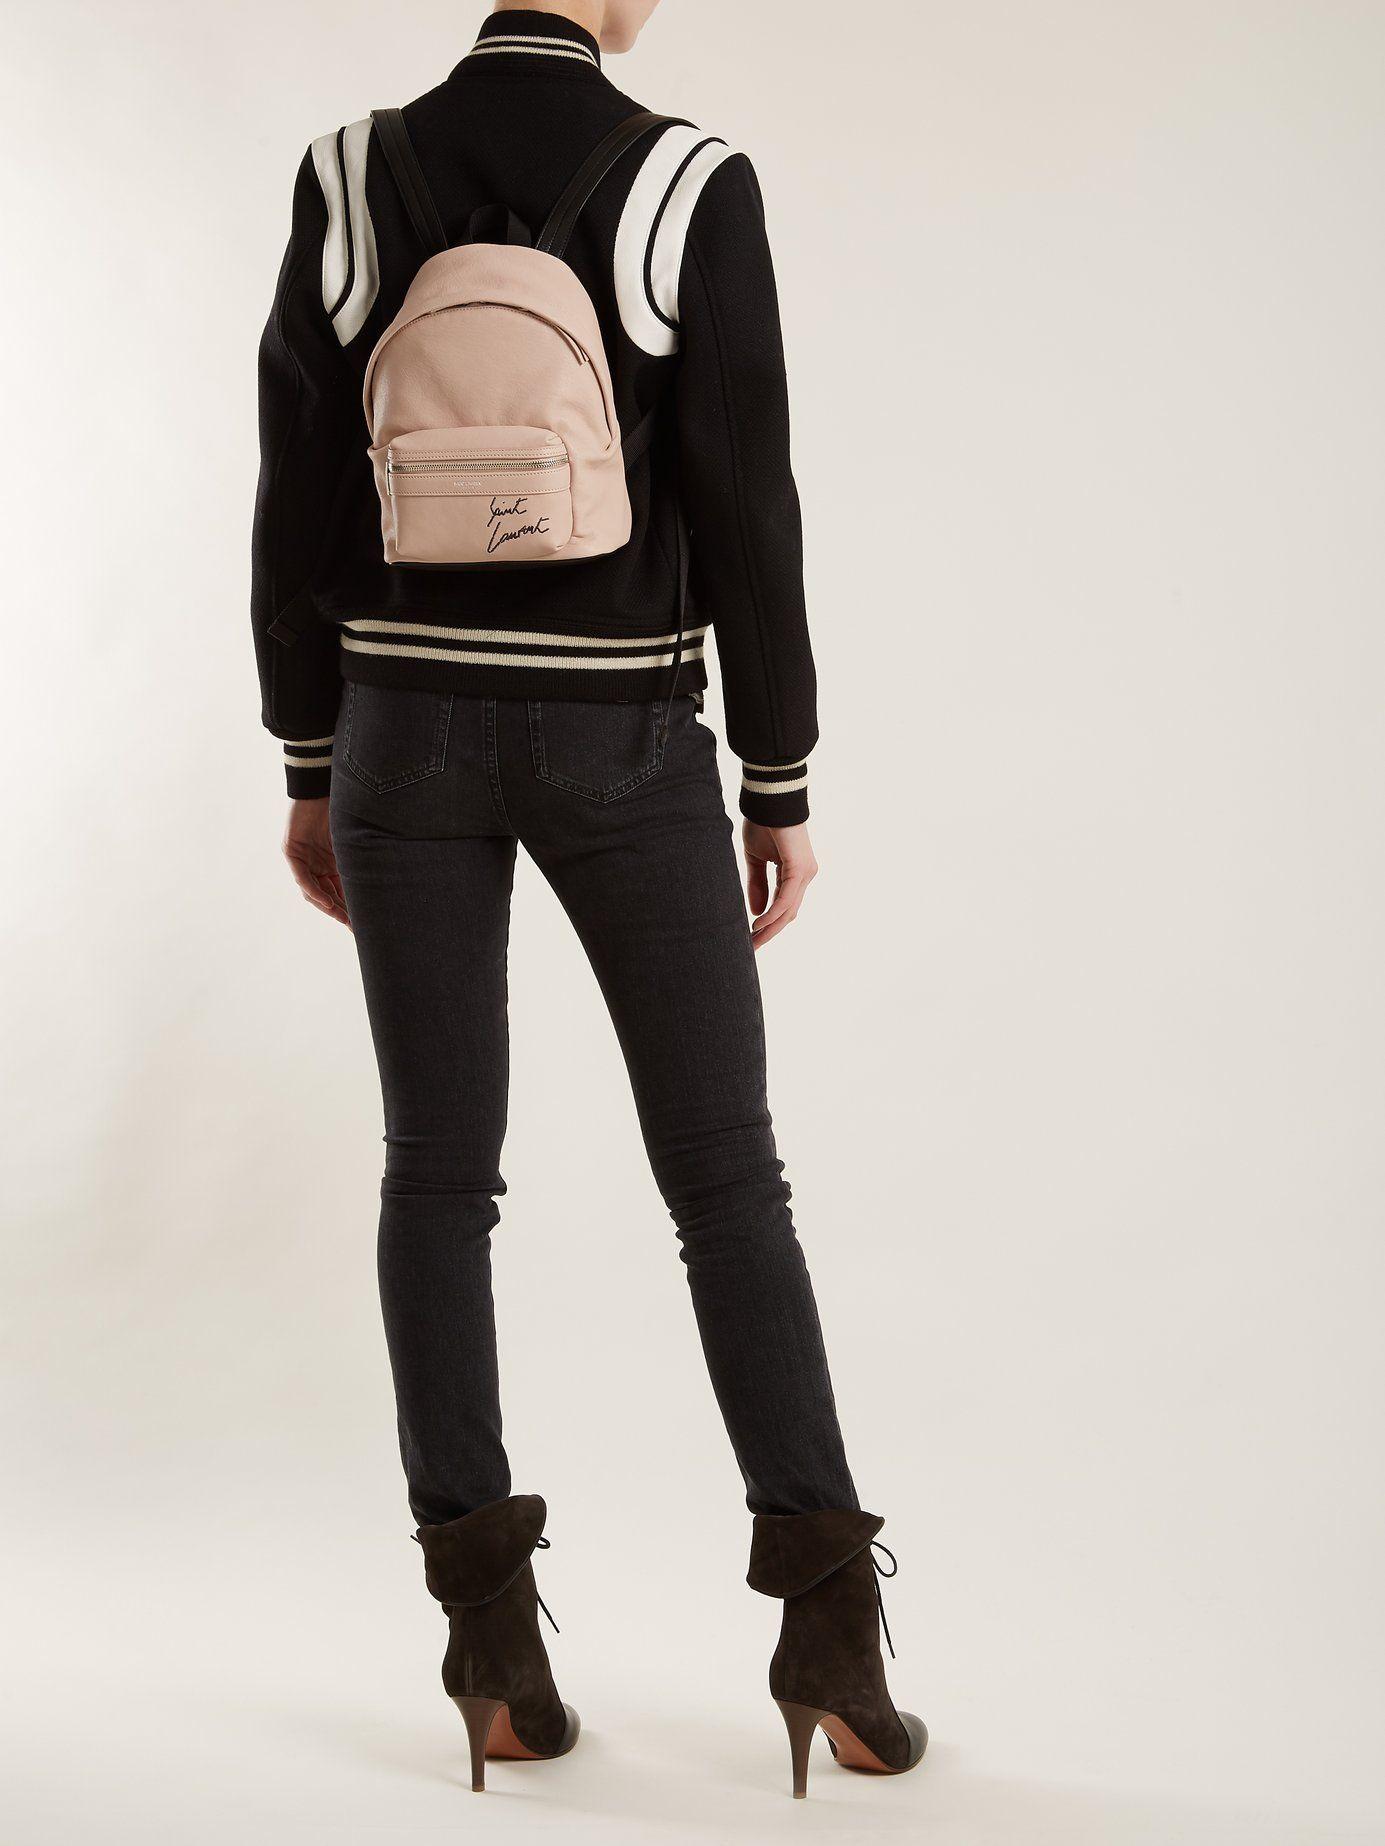 4954b68f2 Toy-city embroidered mini leather backpack | Saint Laurent |  MATCHESFASHION.COM UK